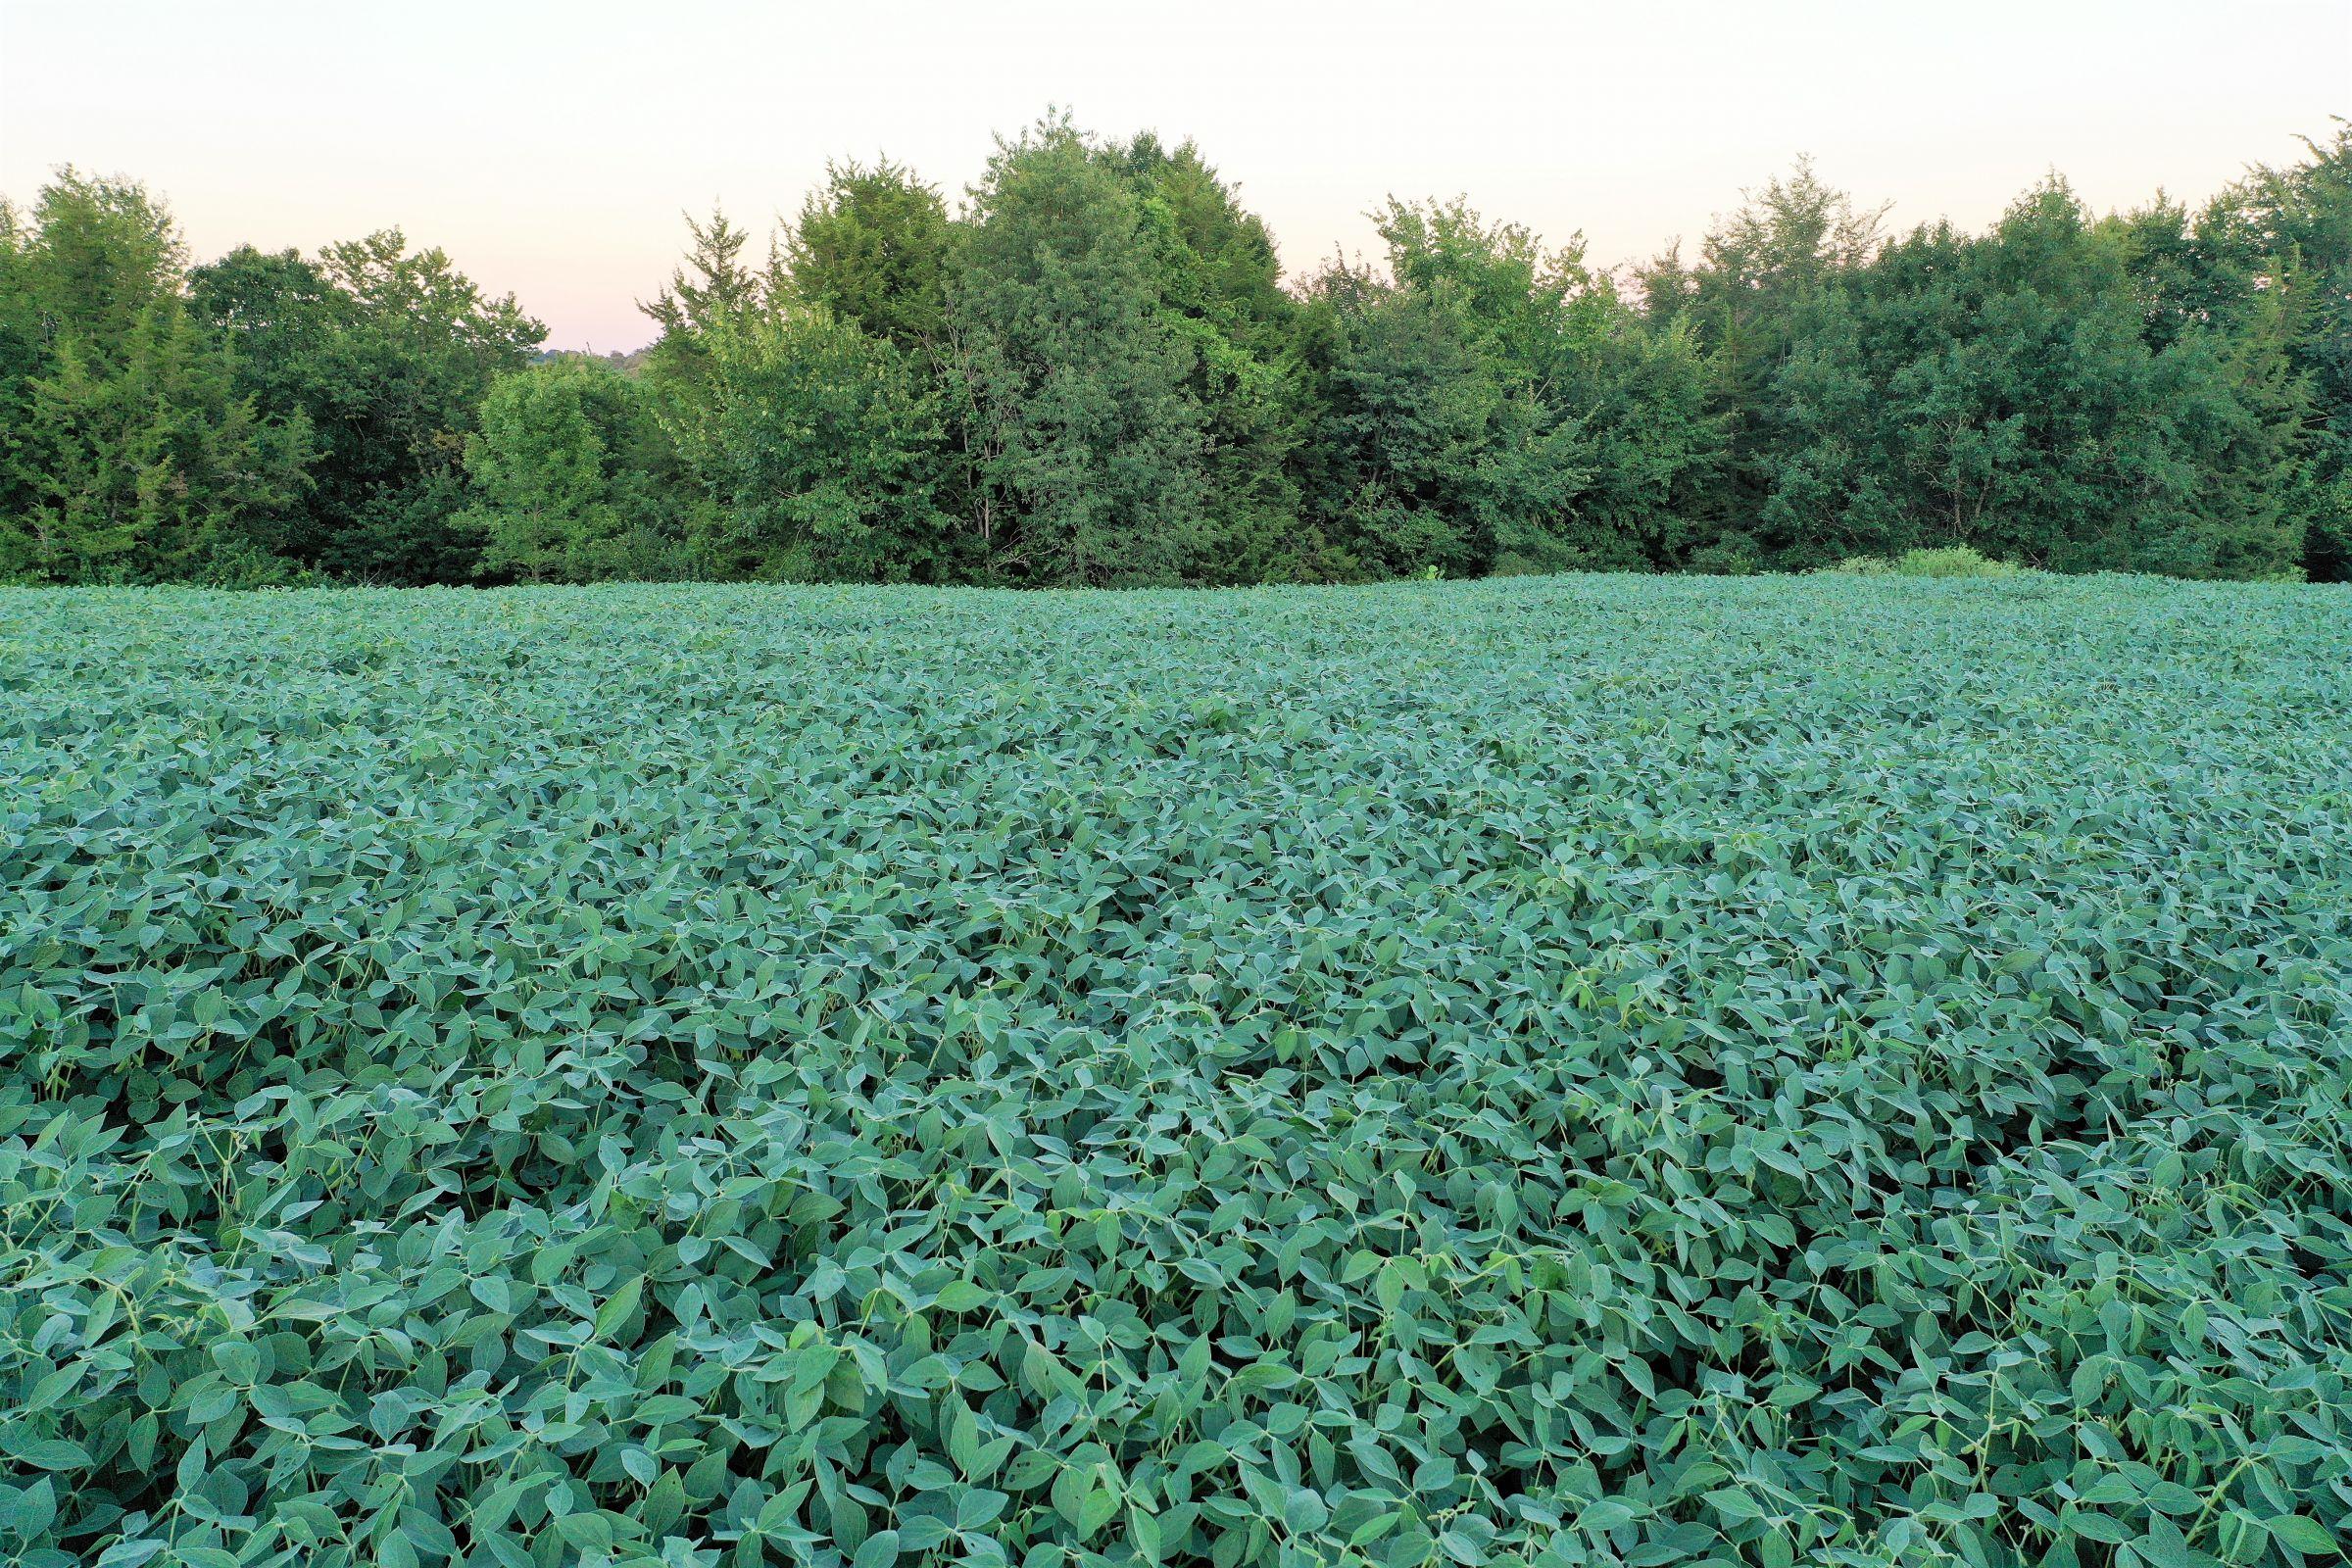 land-clarke-county-iowa-325-acres-listing-number-15416-7-2021-03-18-163322.JPG